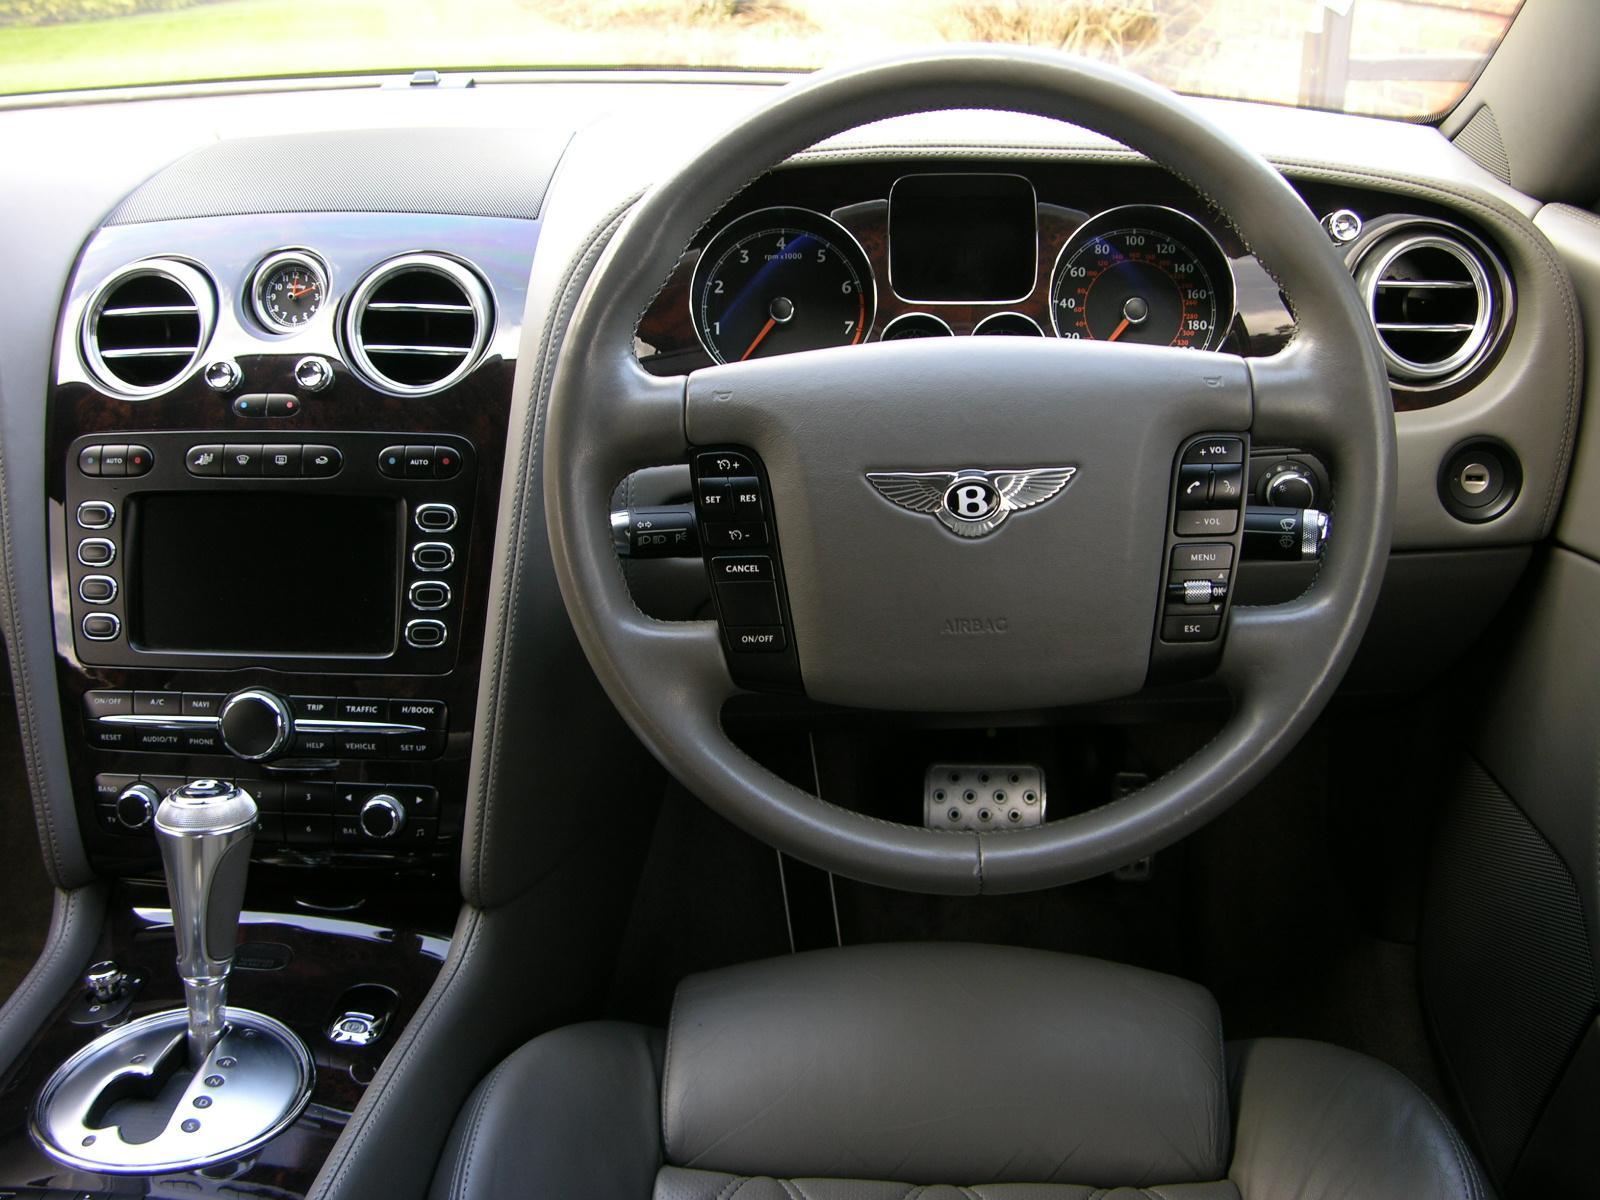 2005 Bentley Continental Gt Image 6